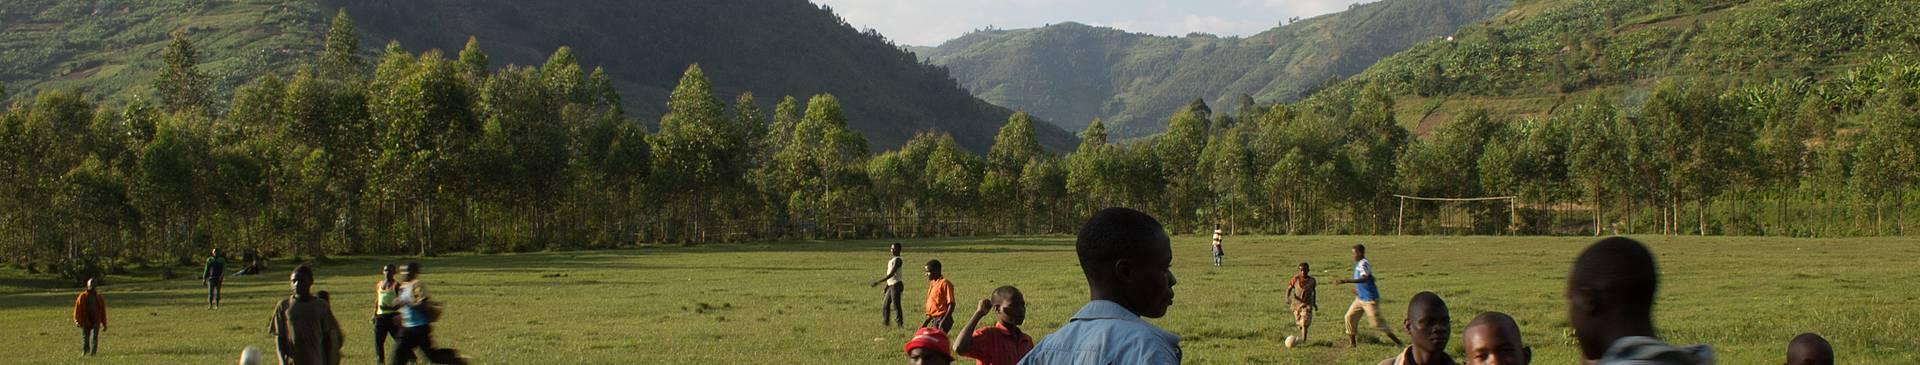 Rwanda in October